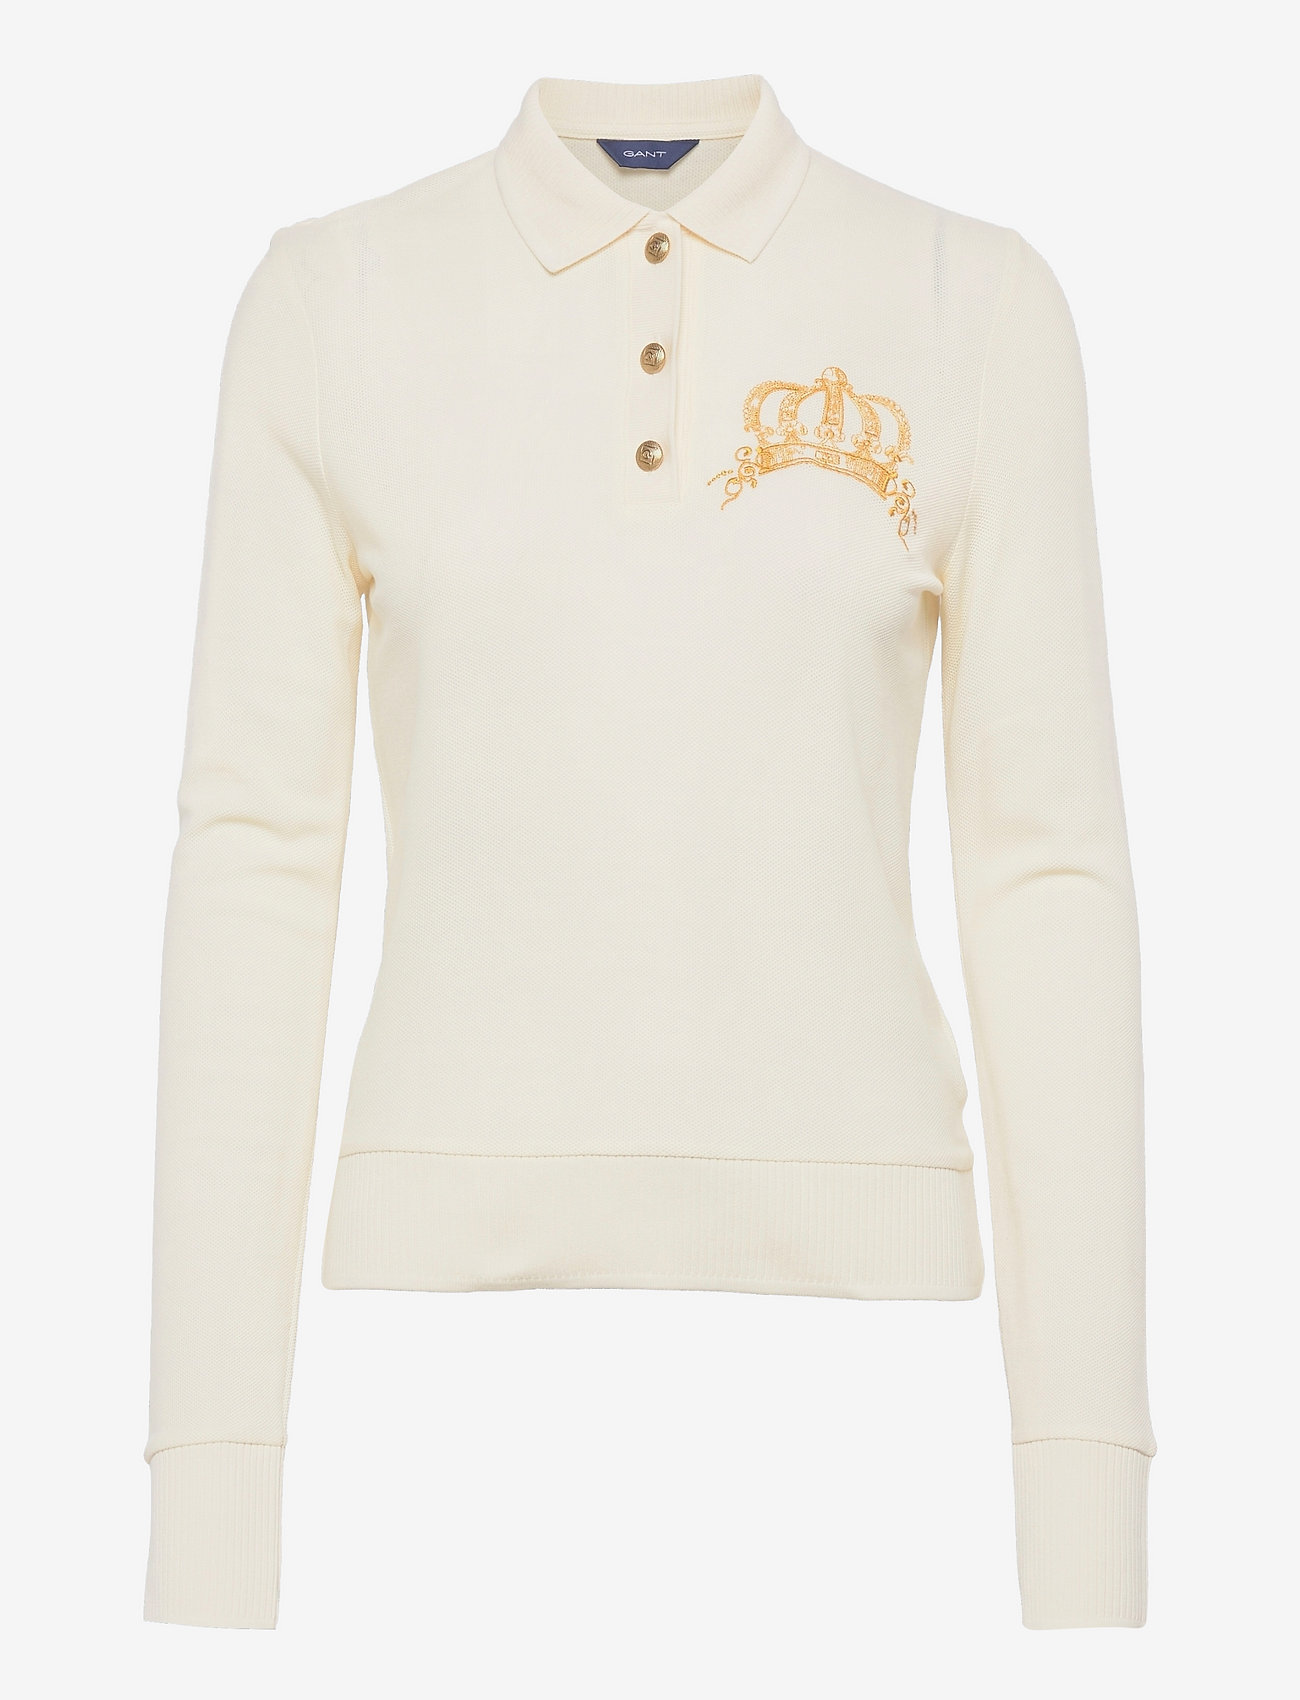 GANT - D1. CROWN EMBROIDERY POLO PIQUE - t-shirt & tops - cream - 0